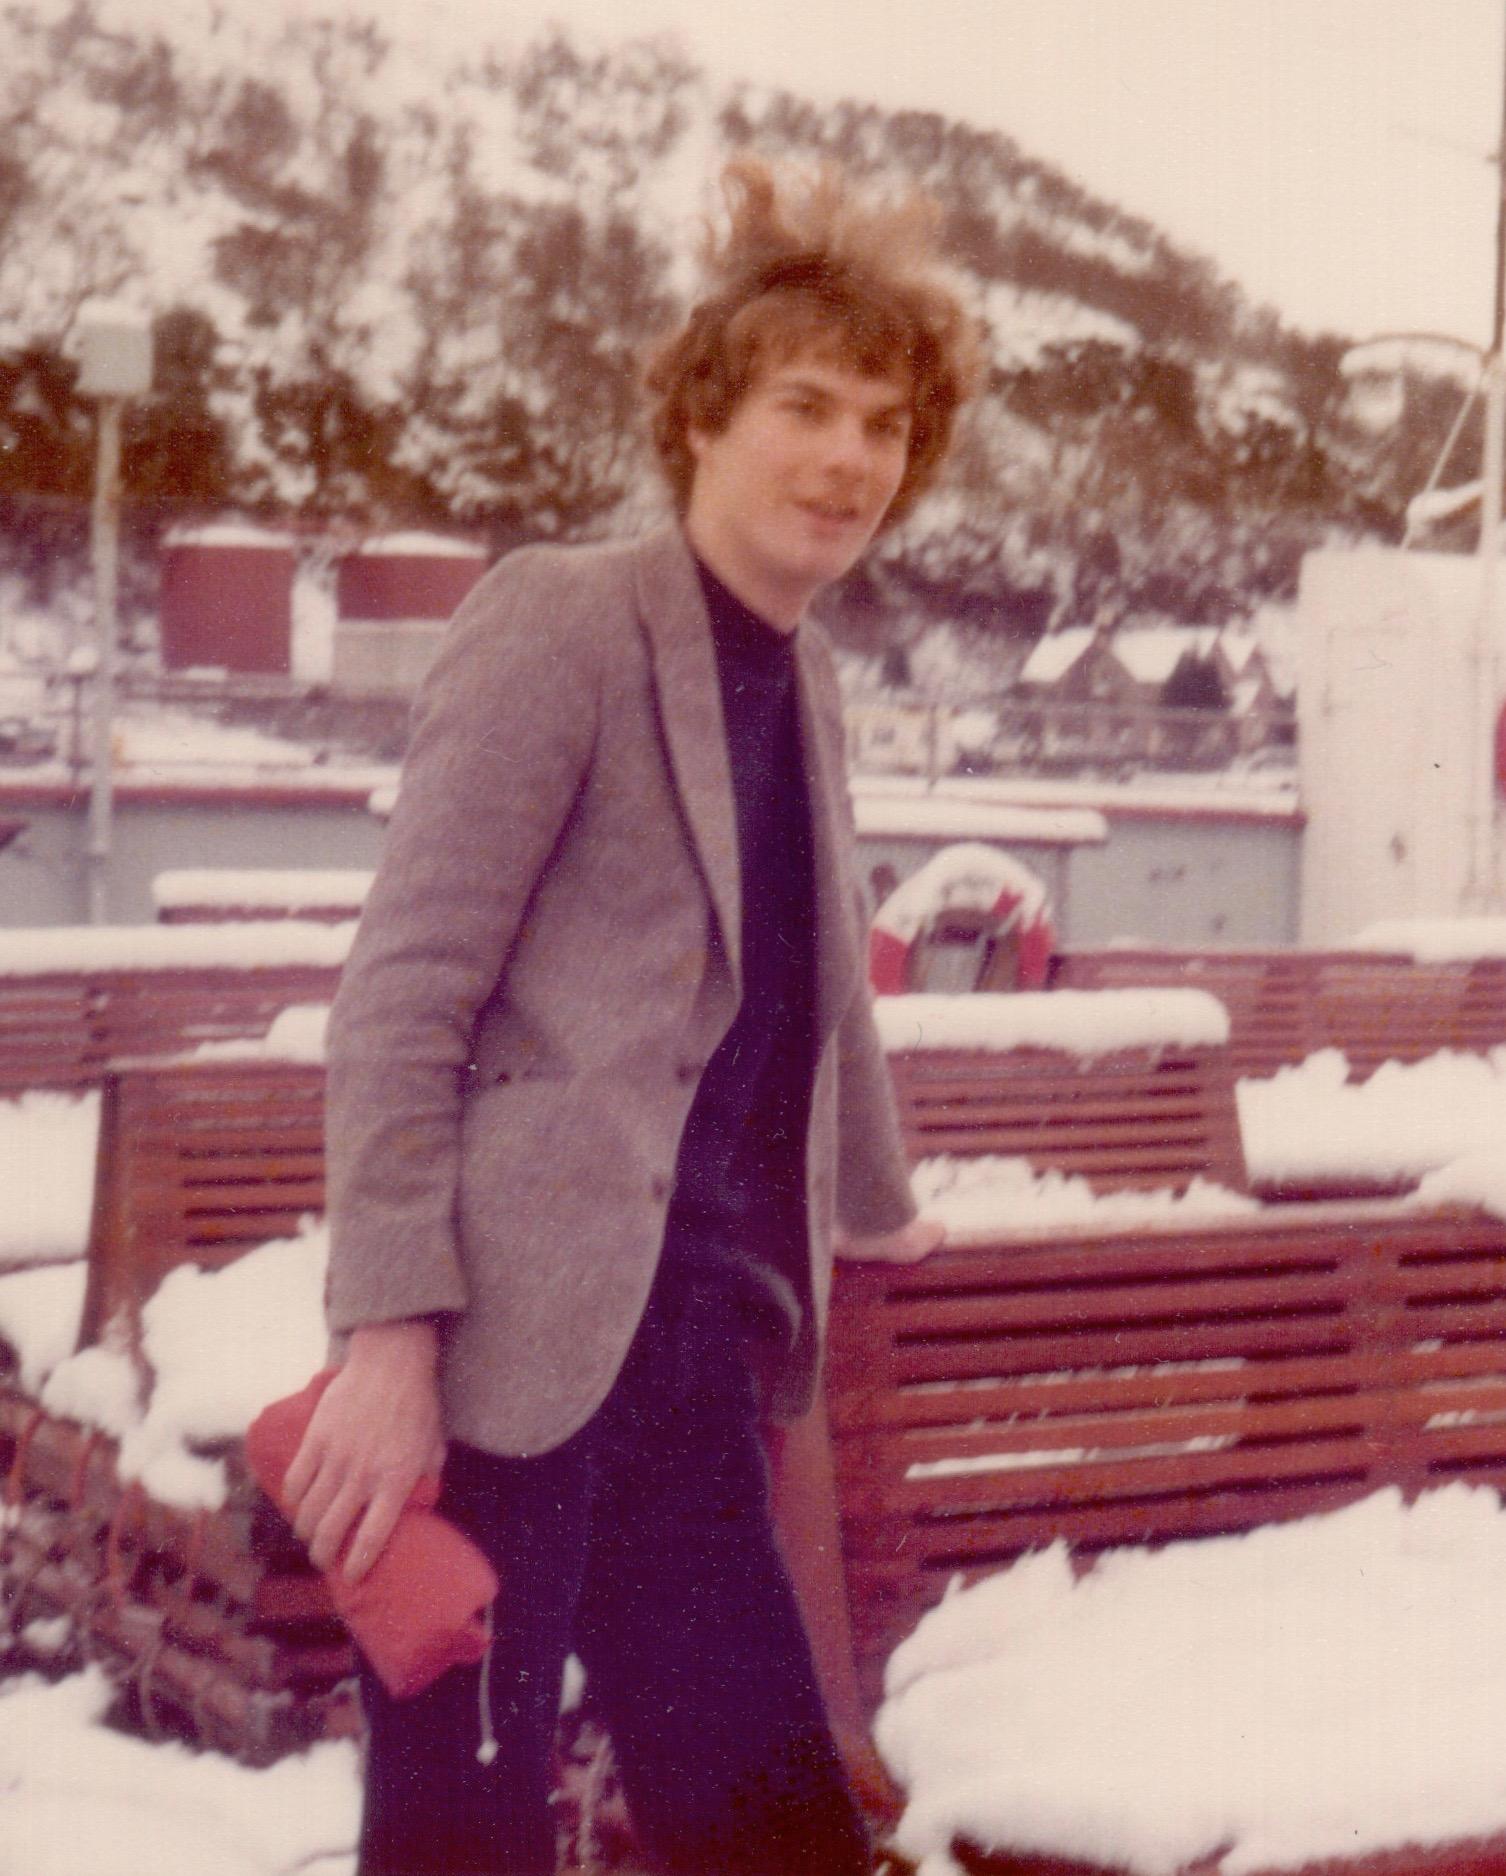 Robert Pimm 1979